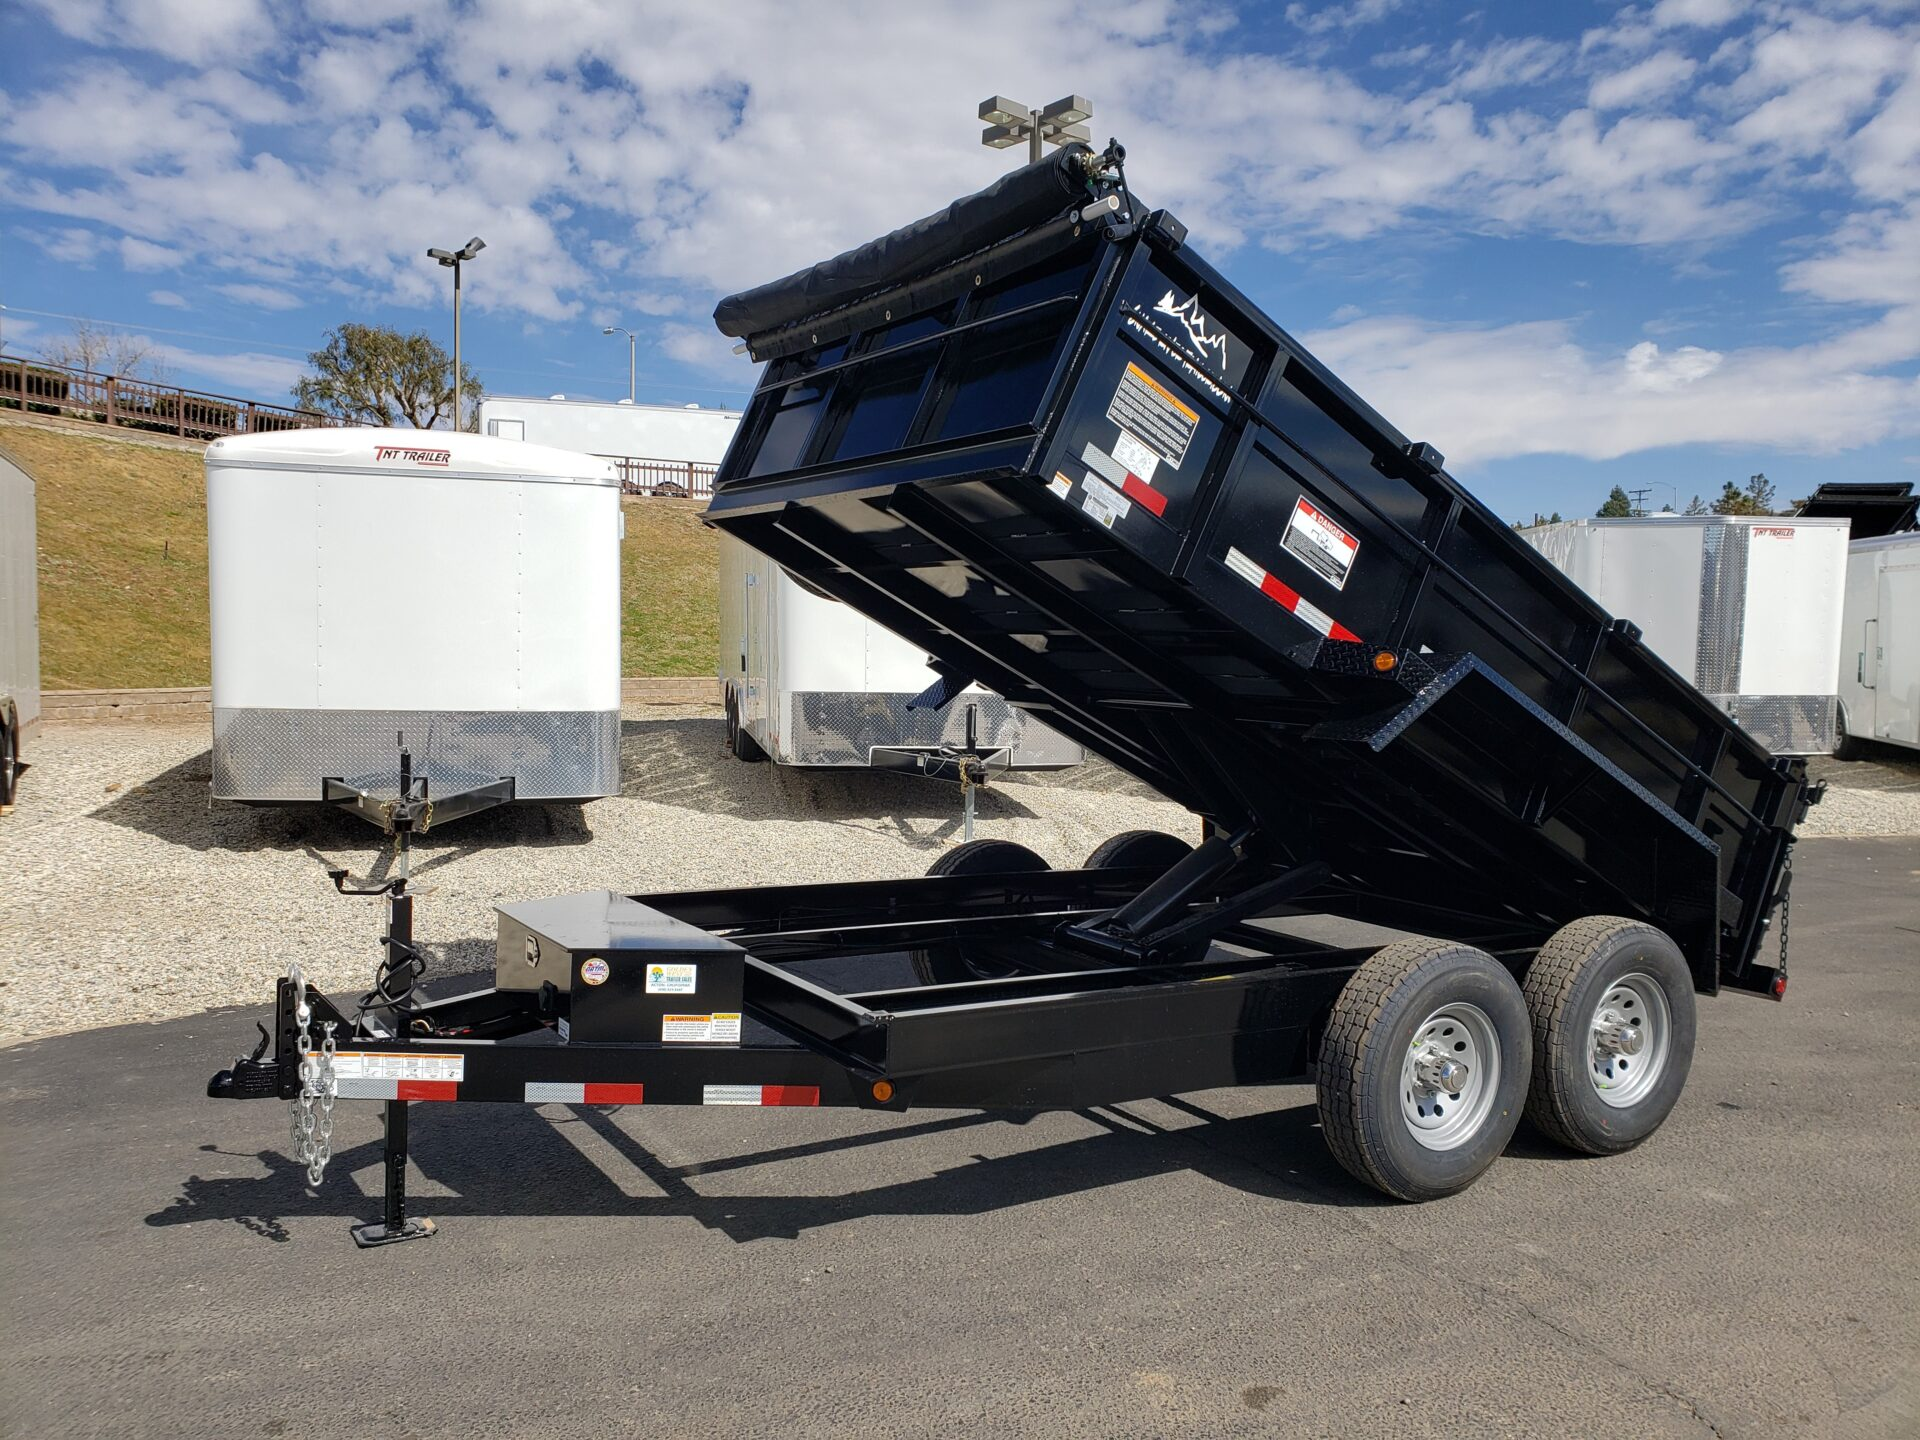 Snake River 7x12 Dump 2ft/SG - Driver side front 3/4 view bed up